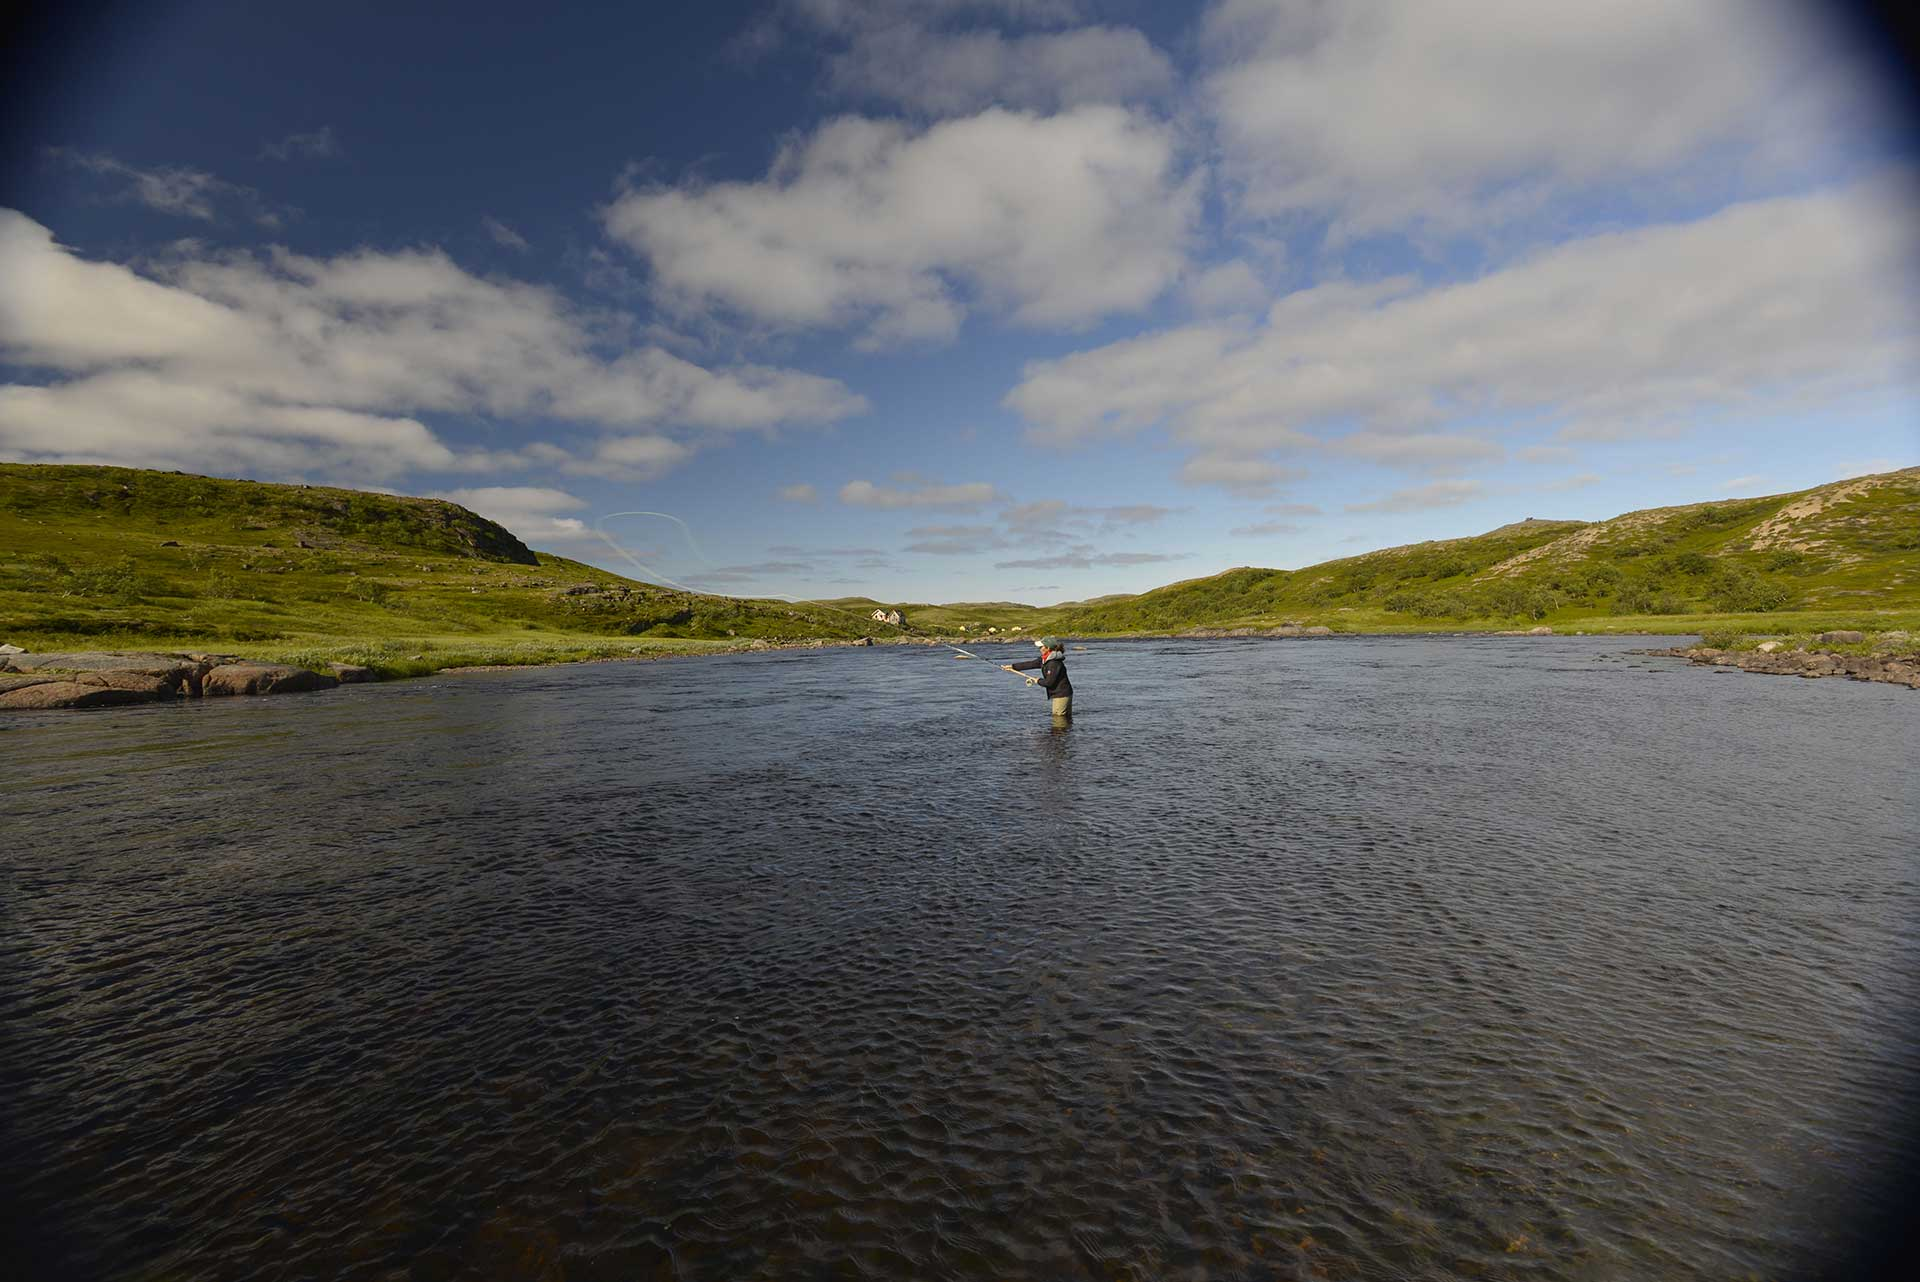 Russie Rynda Gal Pac Voyages de pêche